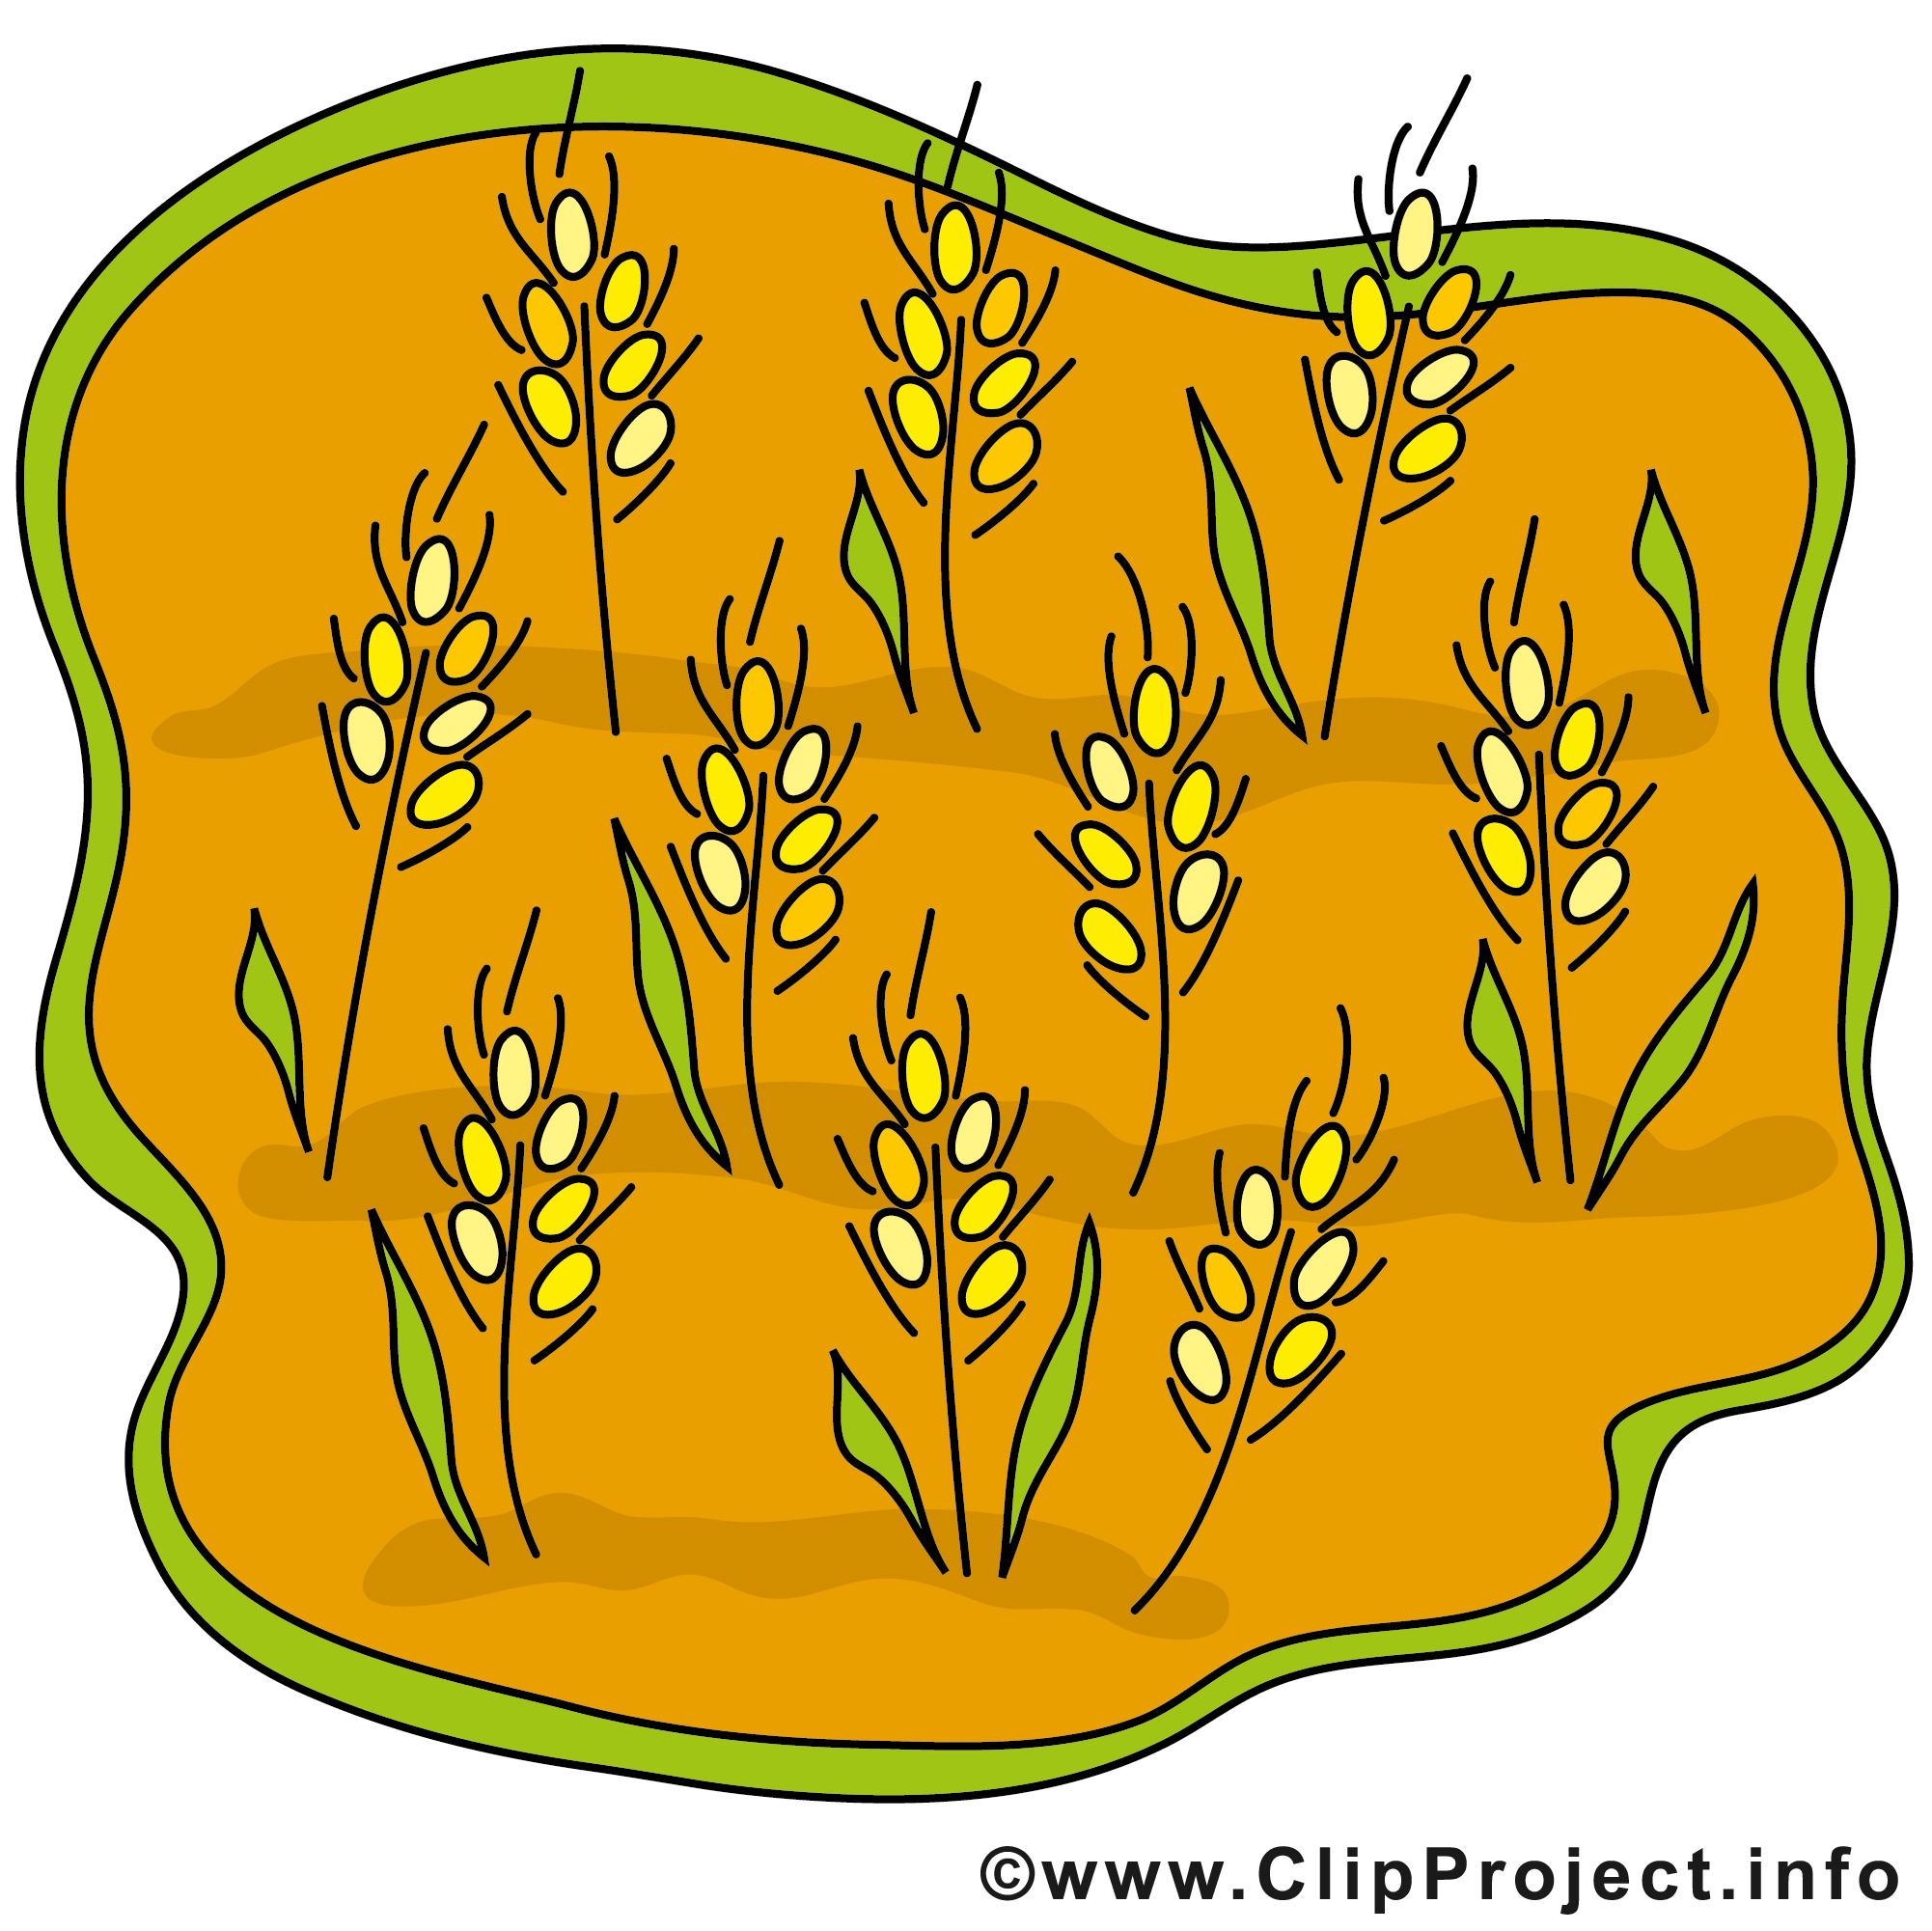 Getreide clipart #1, Download drawings